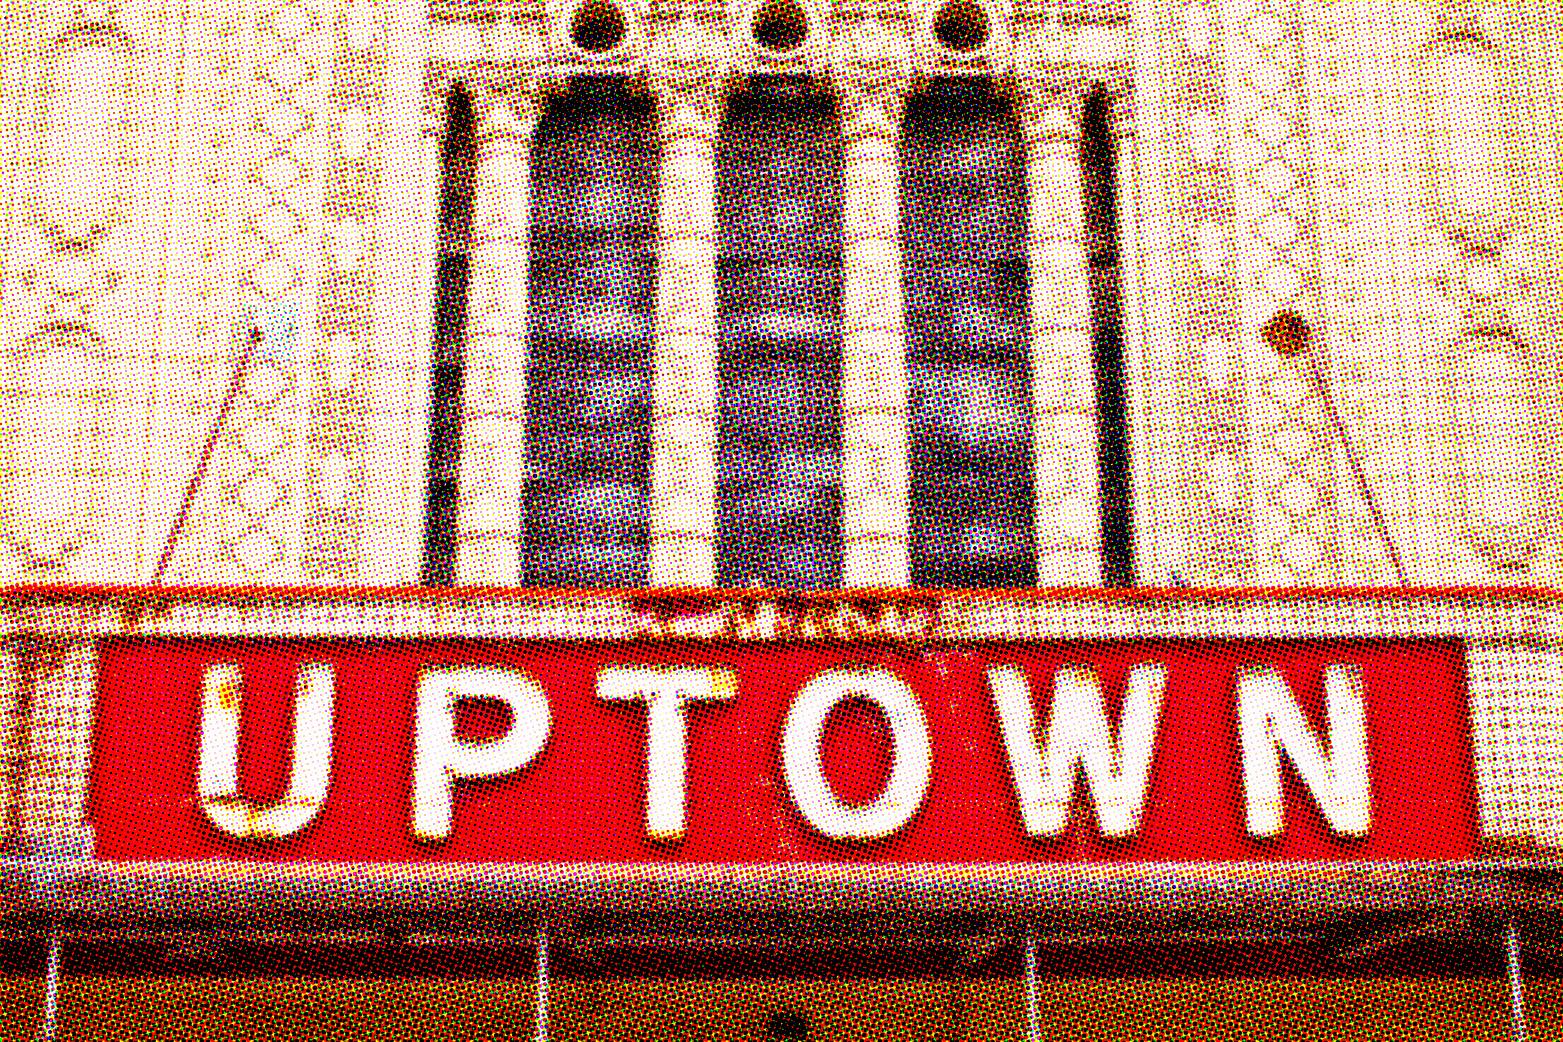 uptown_new.jpg